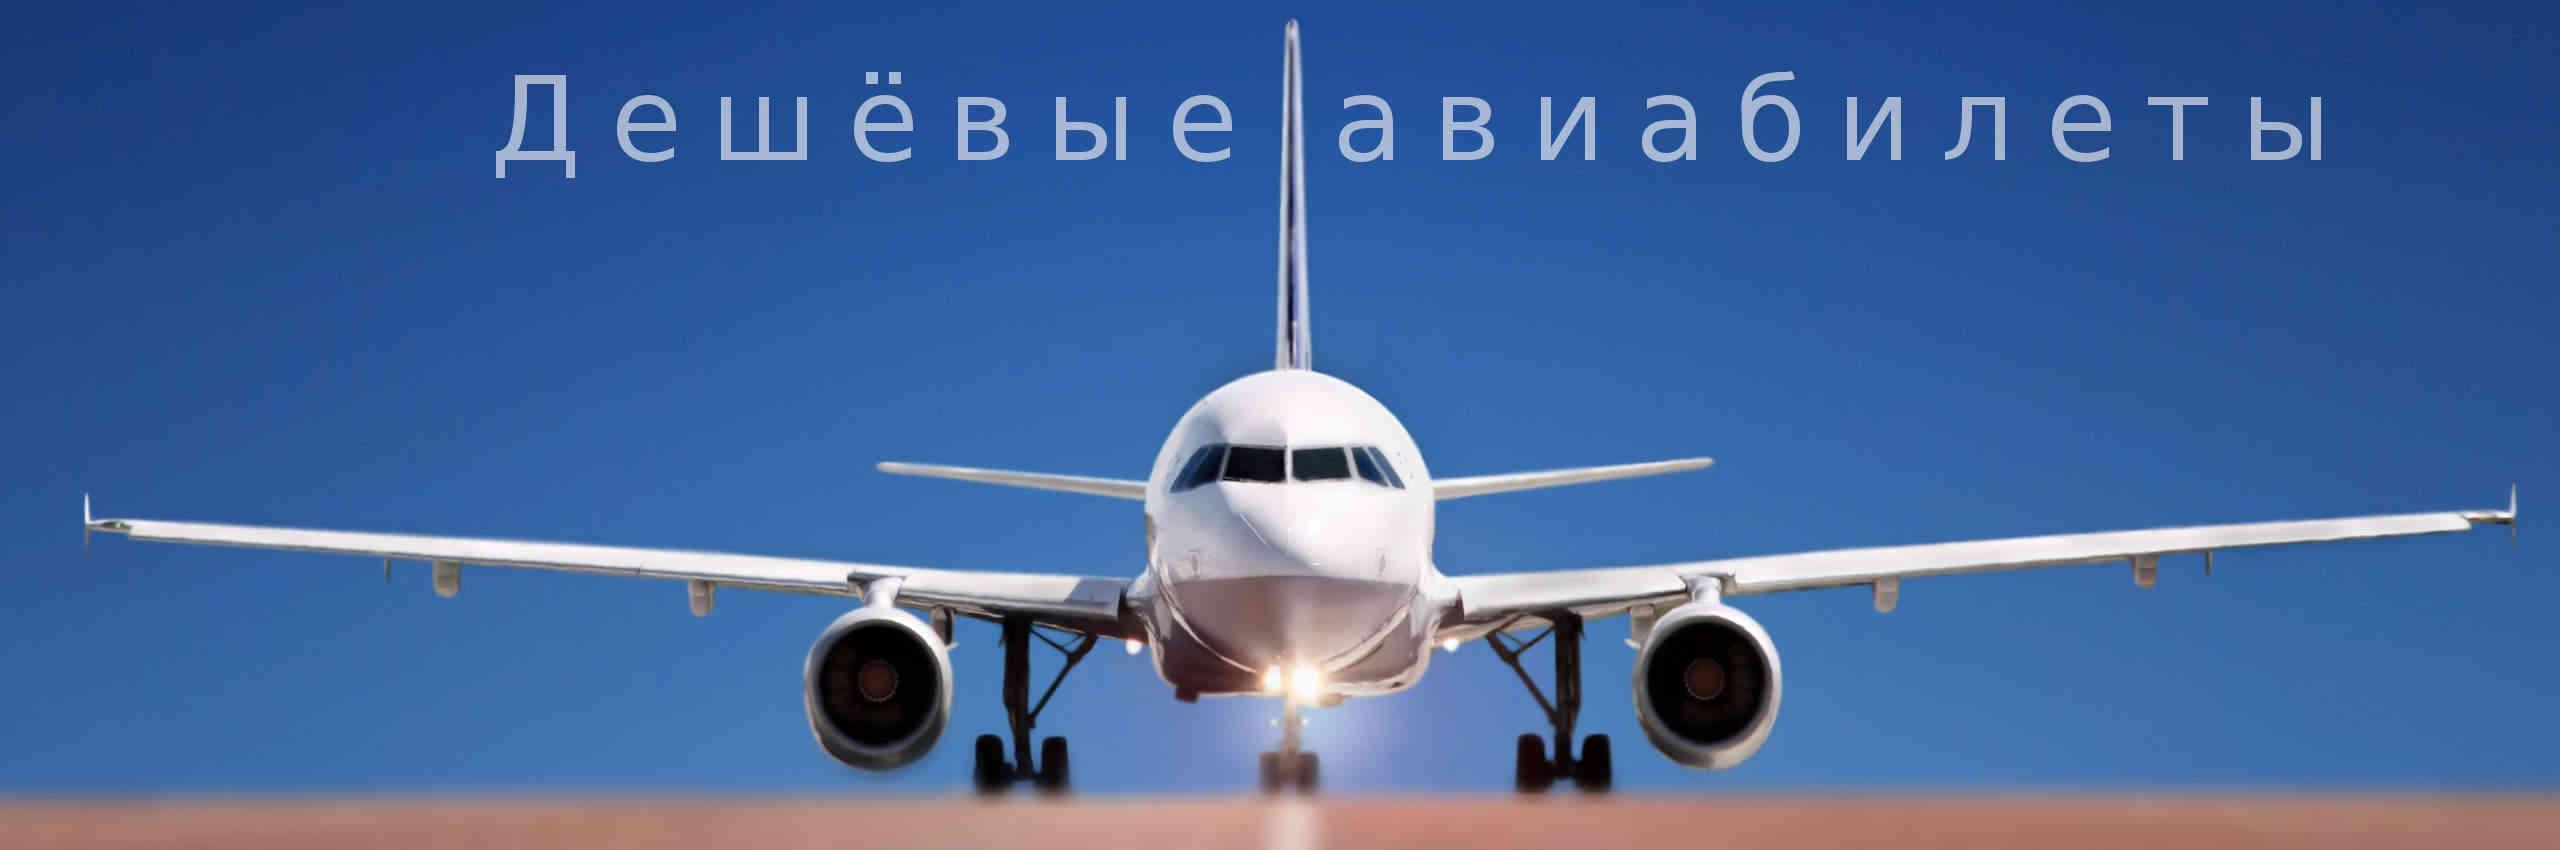 Дешёвые авиабилеты, самолёт